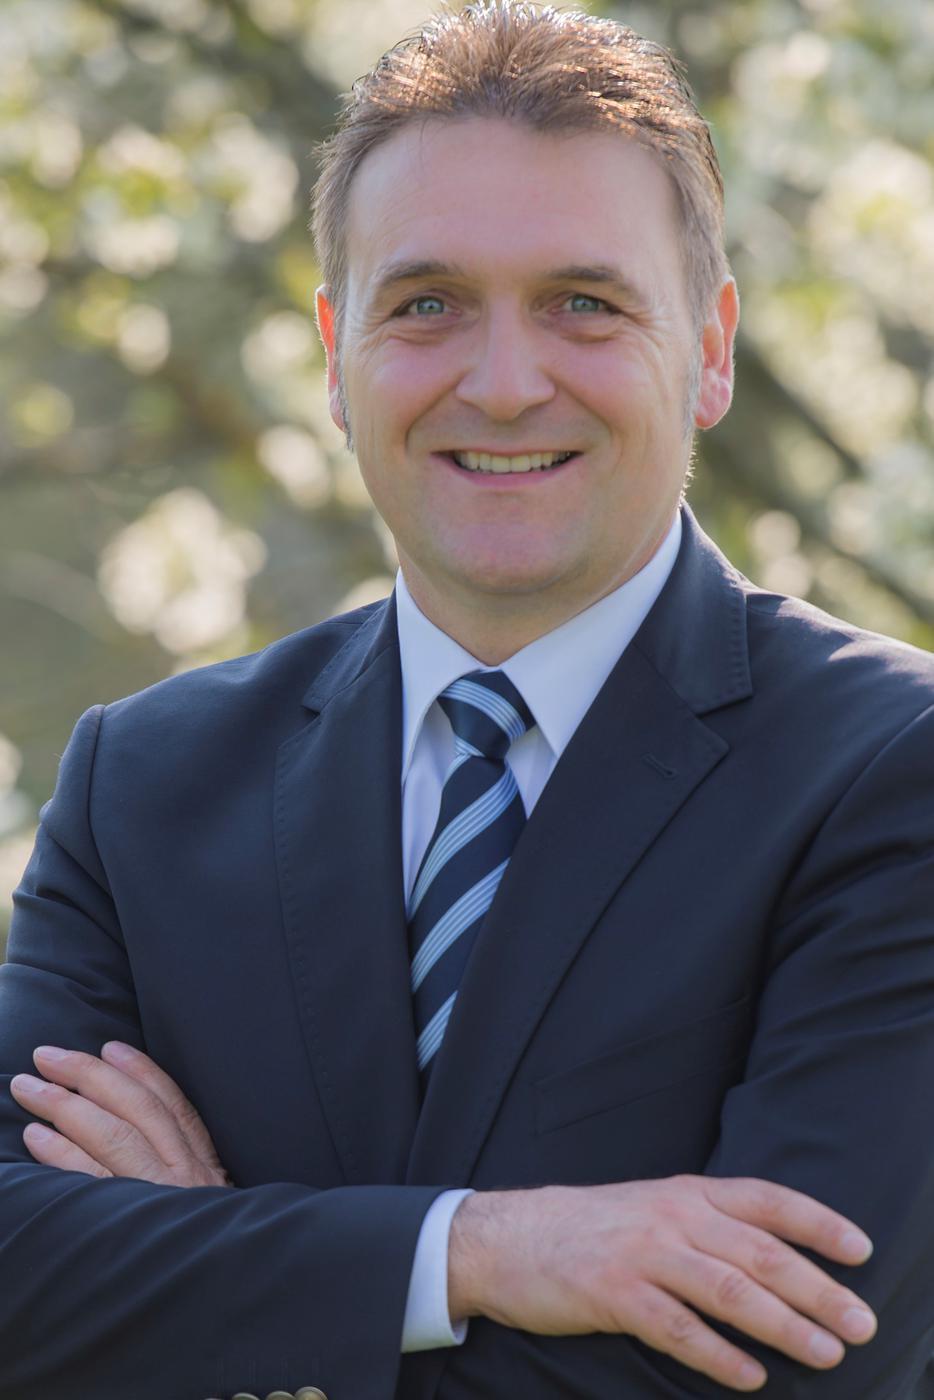 Heiko Faber, Bürgermeister von Kieselbronn